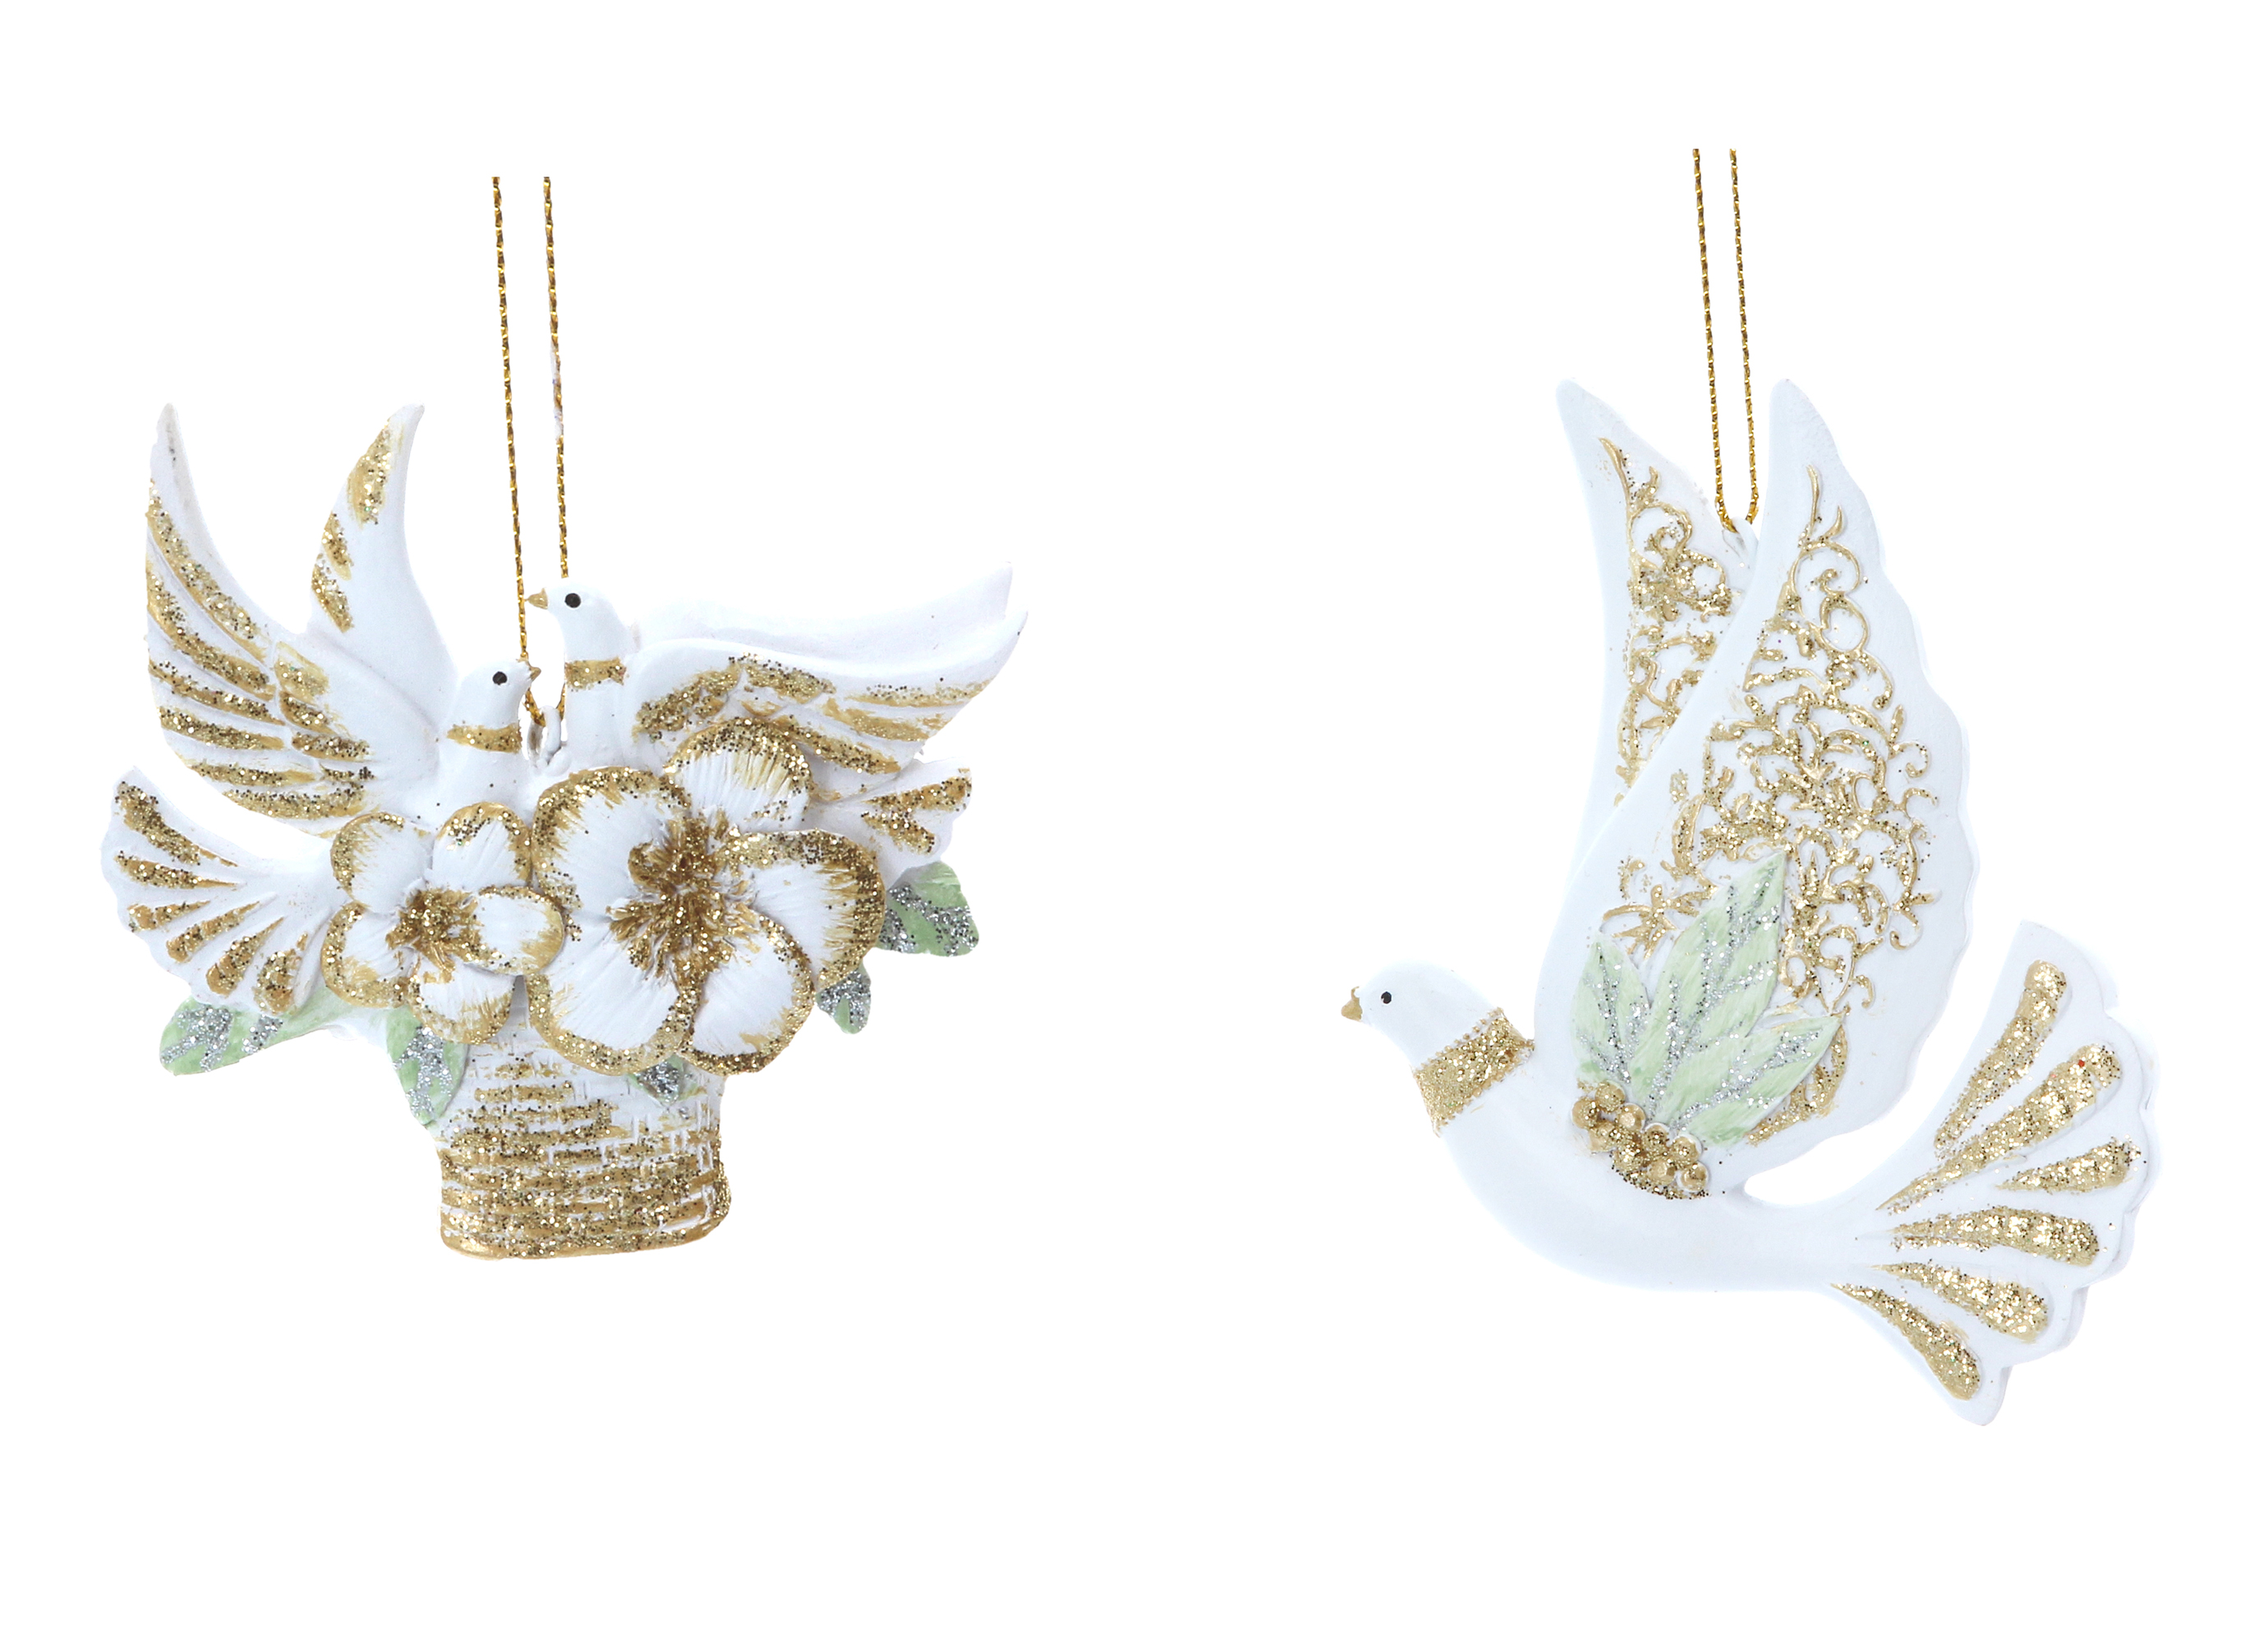 2 x Luxury Gisela Graham Dove /& Flower Hanging Decorations Christmas Baubles